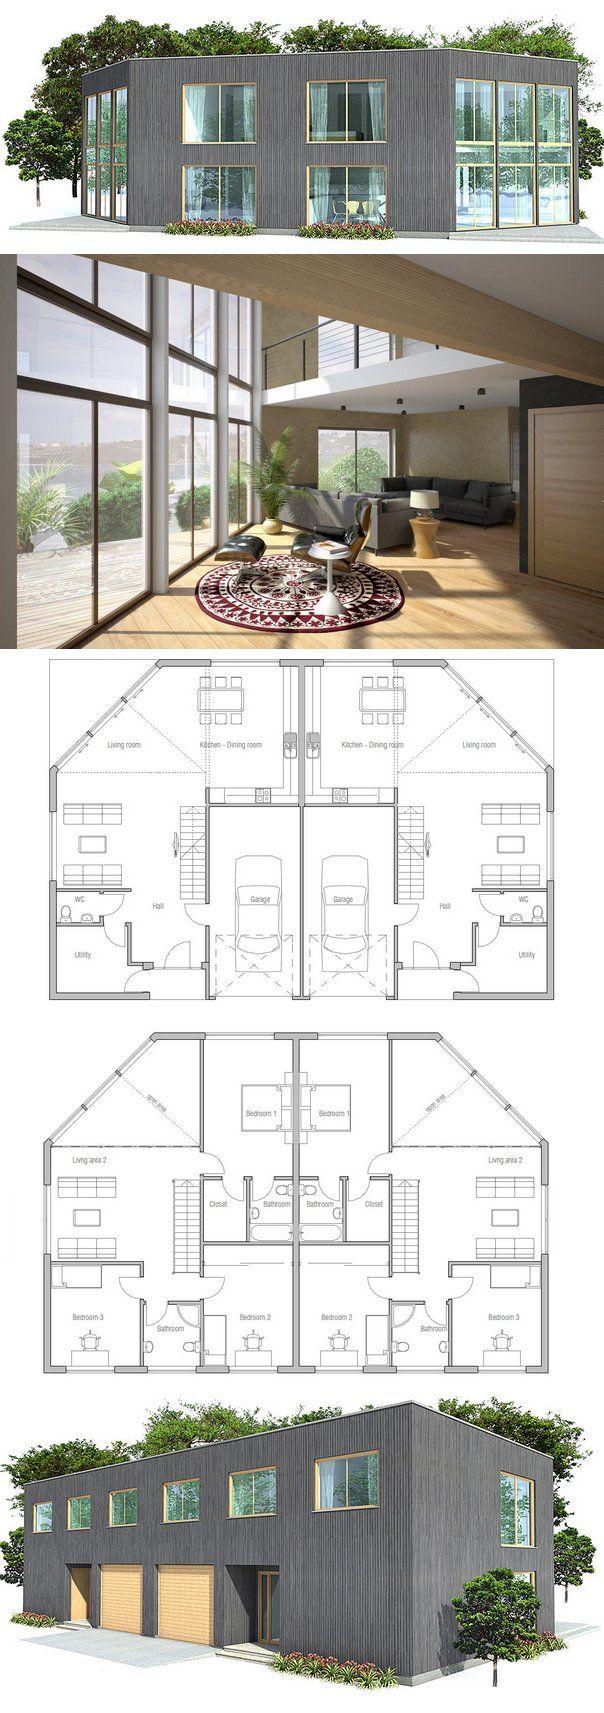 best 20 duplex house ideas on pinterest. Black Bedroom Furniture Sets. Home Design Ideas